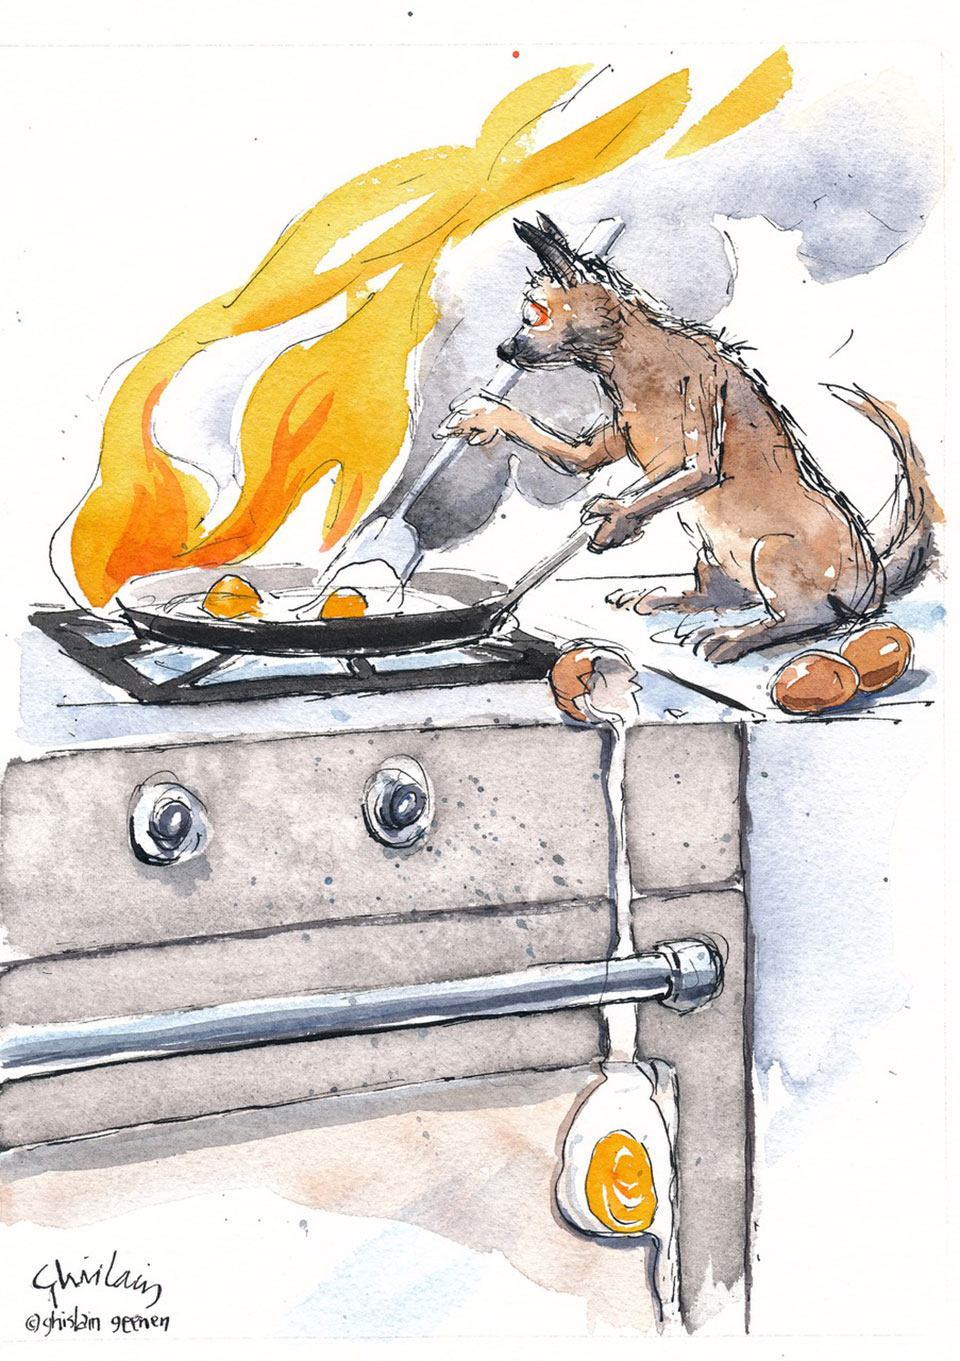 Ratty, the terrier, preparing breakfast.